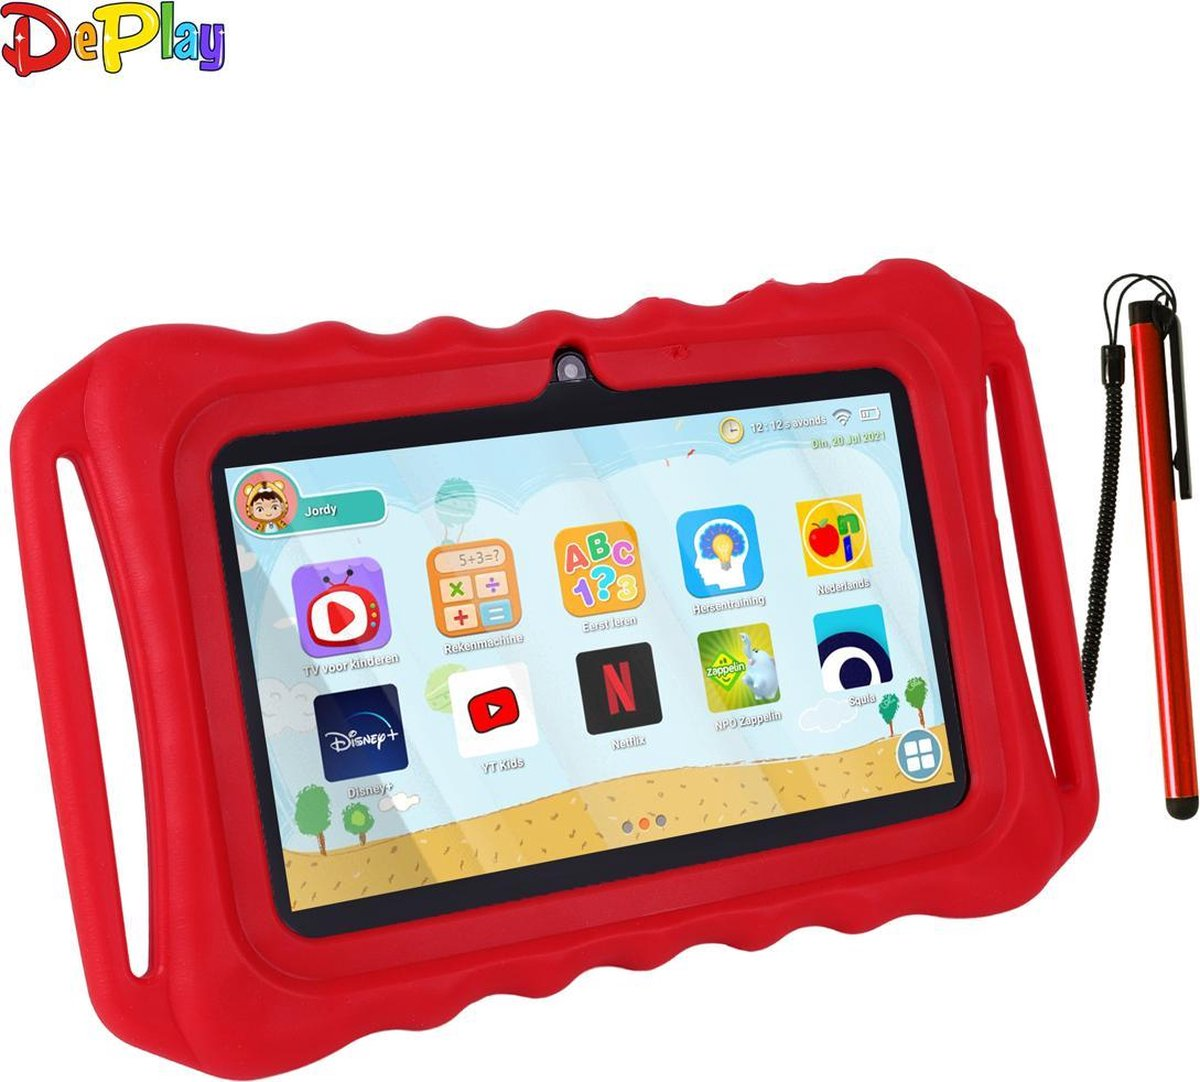 DePlay Kids Tablet - Kindertablet - Ouder Control App - Disney - Netflix Kids - Kinder Tablet - Android 10.0 - 3000 Mah Batterij - Tablet Houder - Kidsproof Beschermhoes - Incl. Touchscreen Pen - Rood